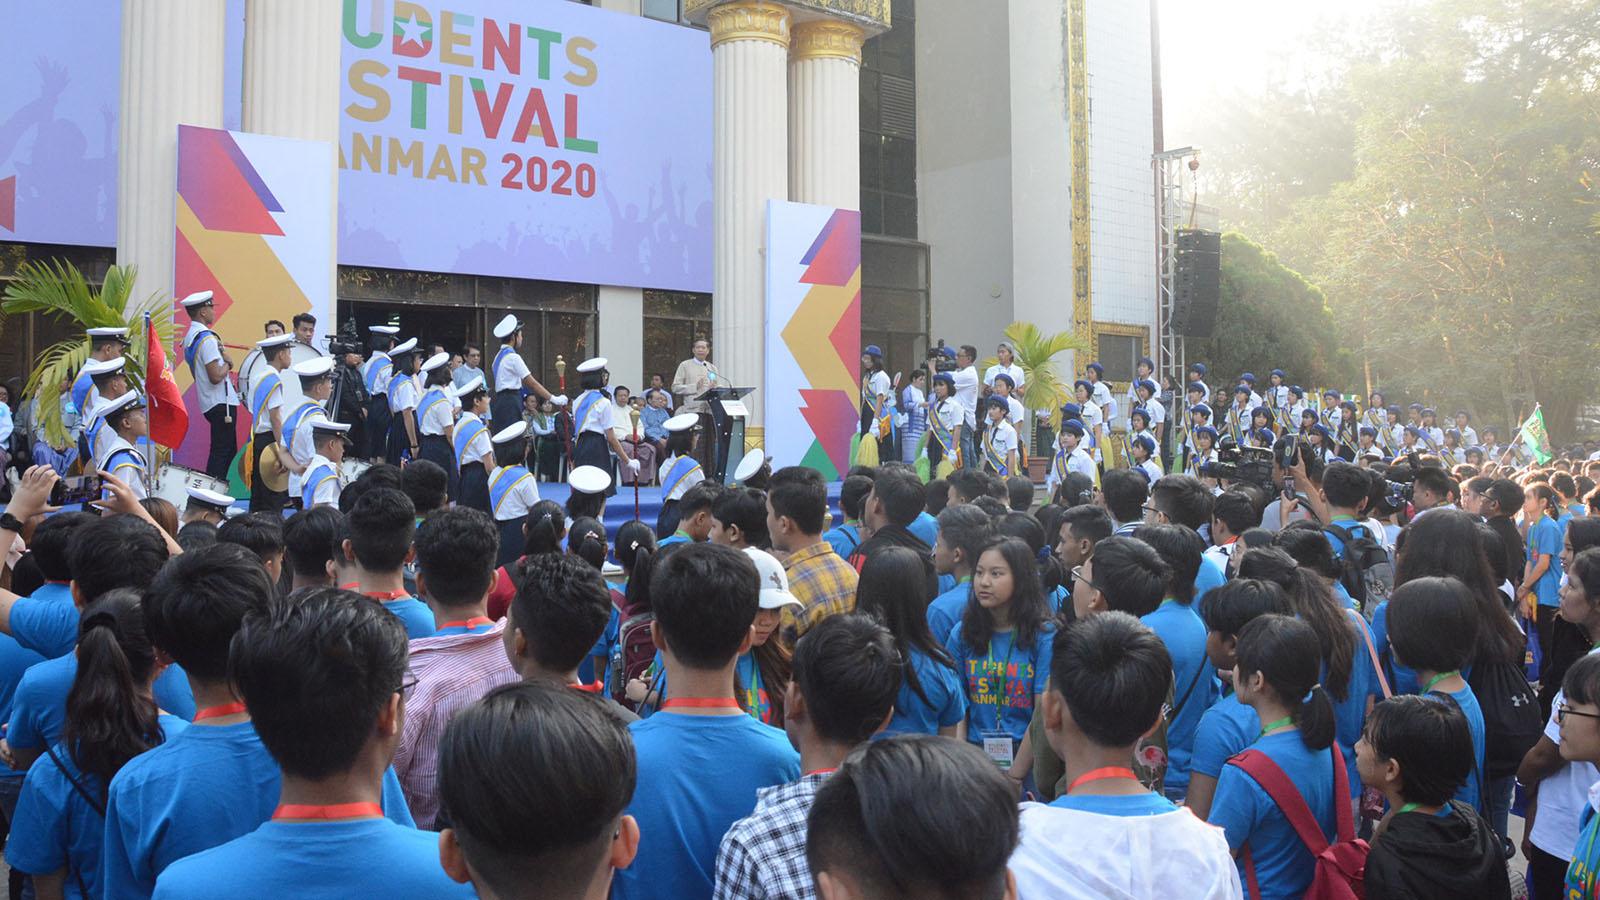 Student Festival Myanmar 2020 being held at the Diamond Jubilee Hall of Yangon University yesterday. Photo: MNA